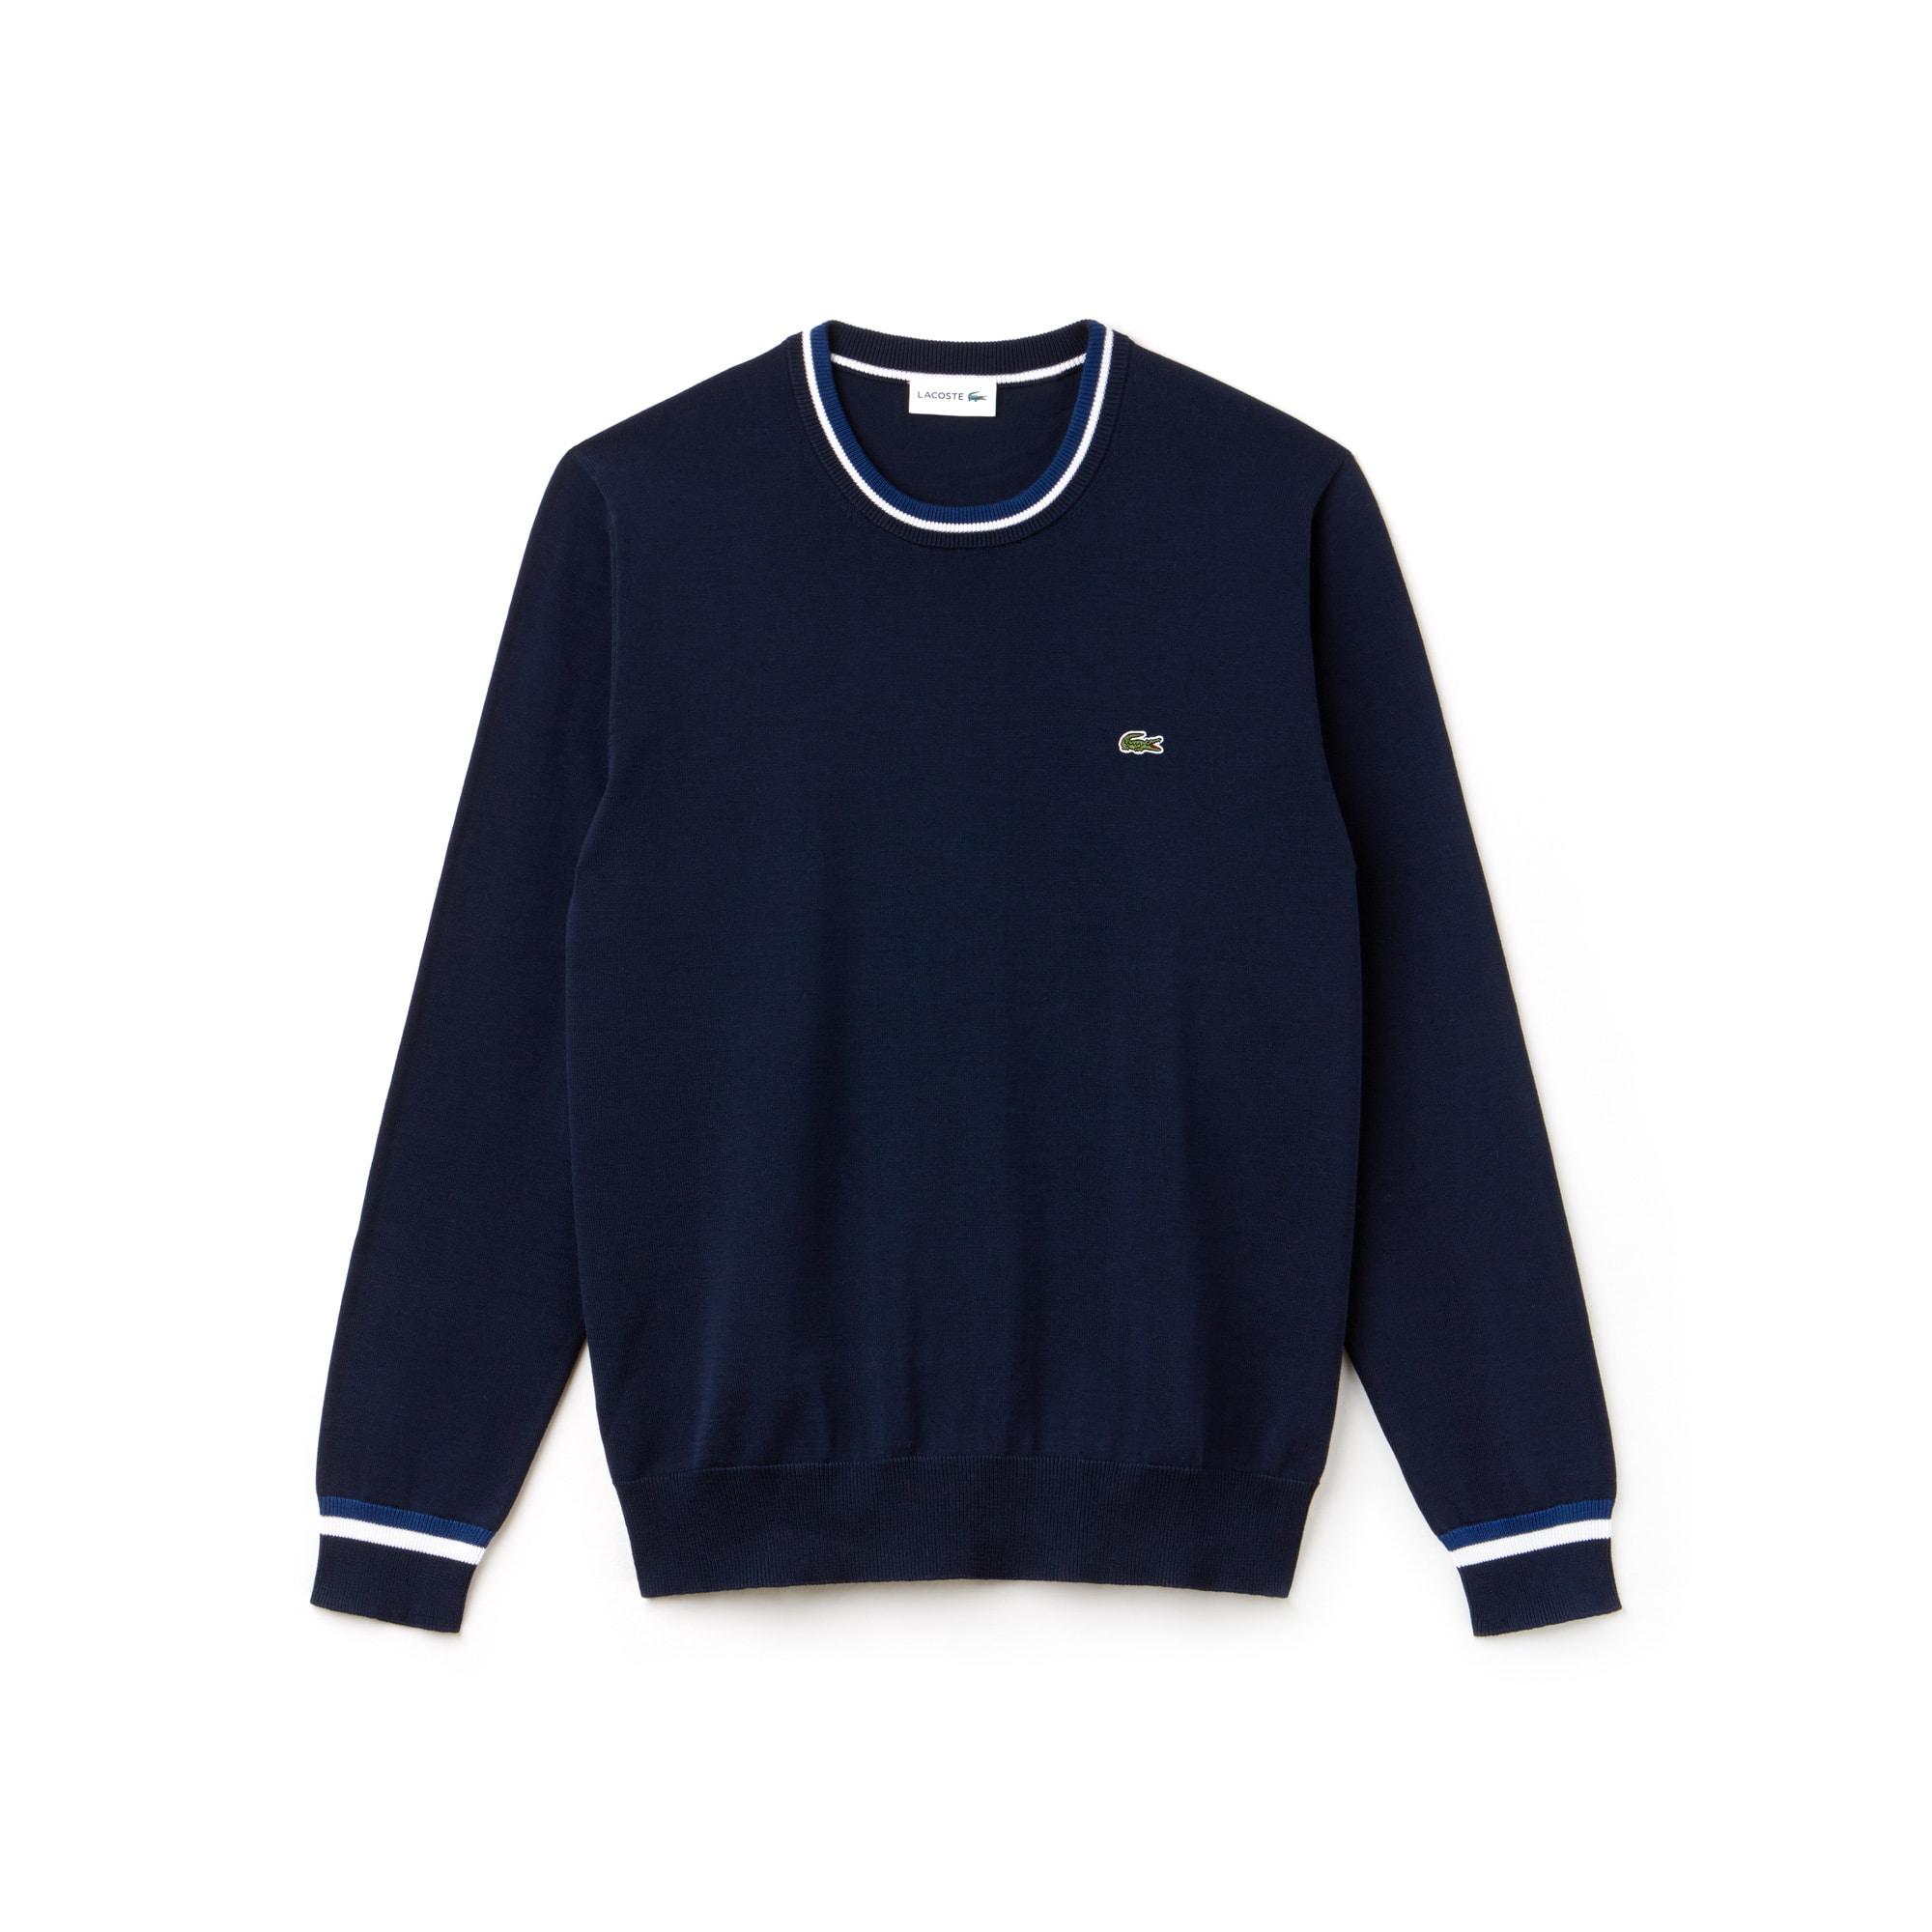 Men's Crew Neck Contrast Accents Pima Cotton Jersey Sweater